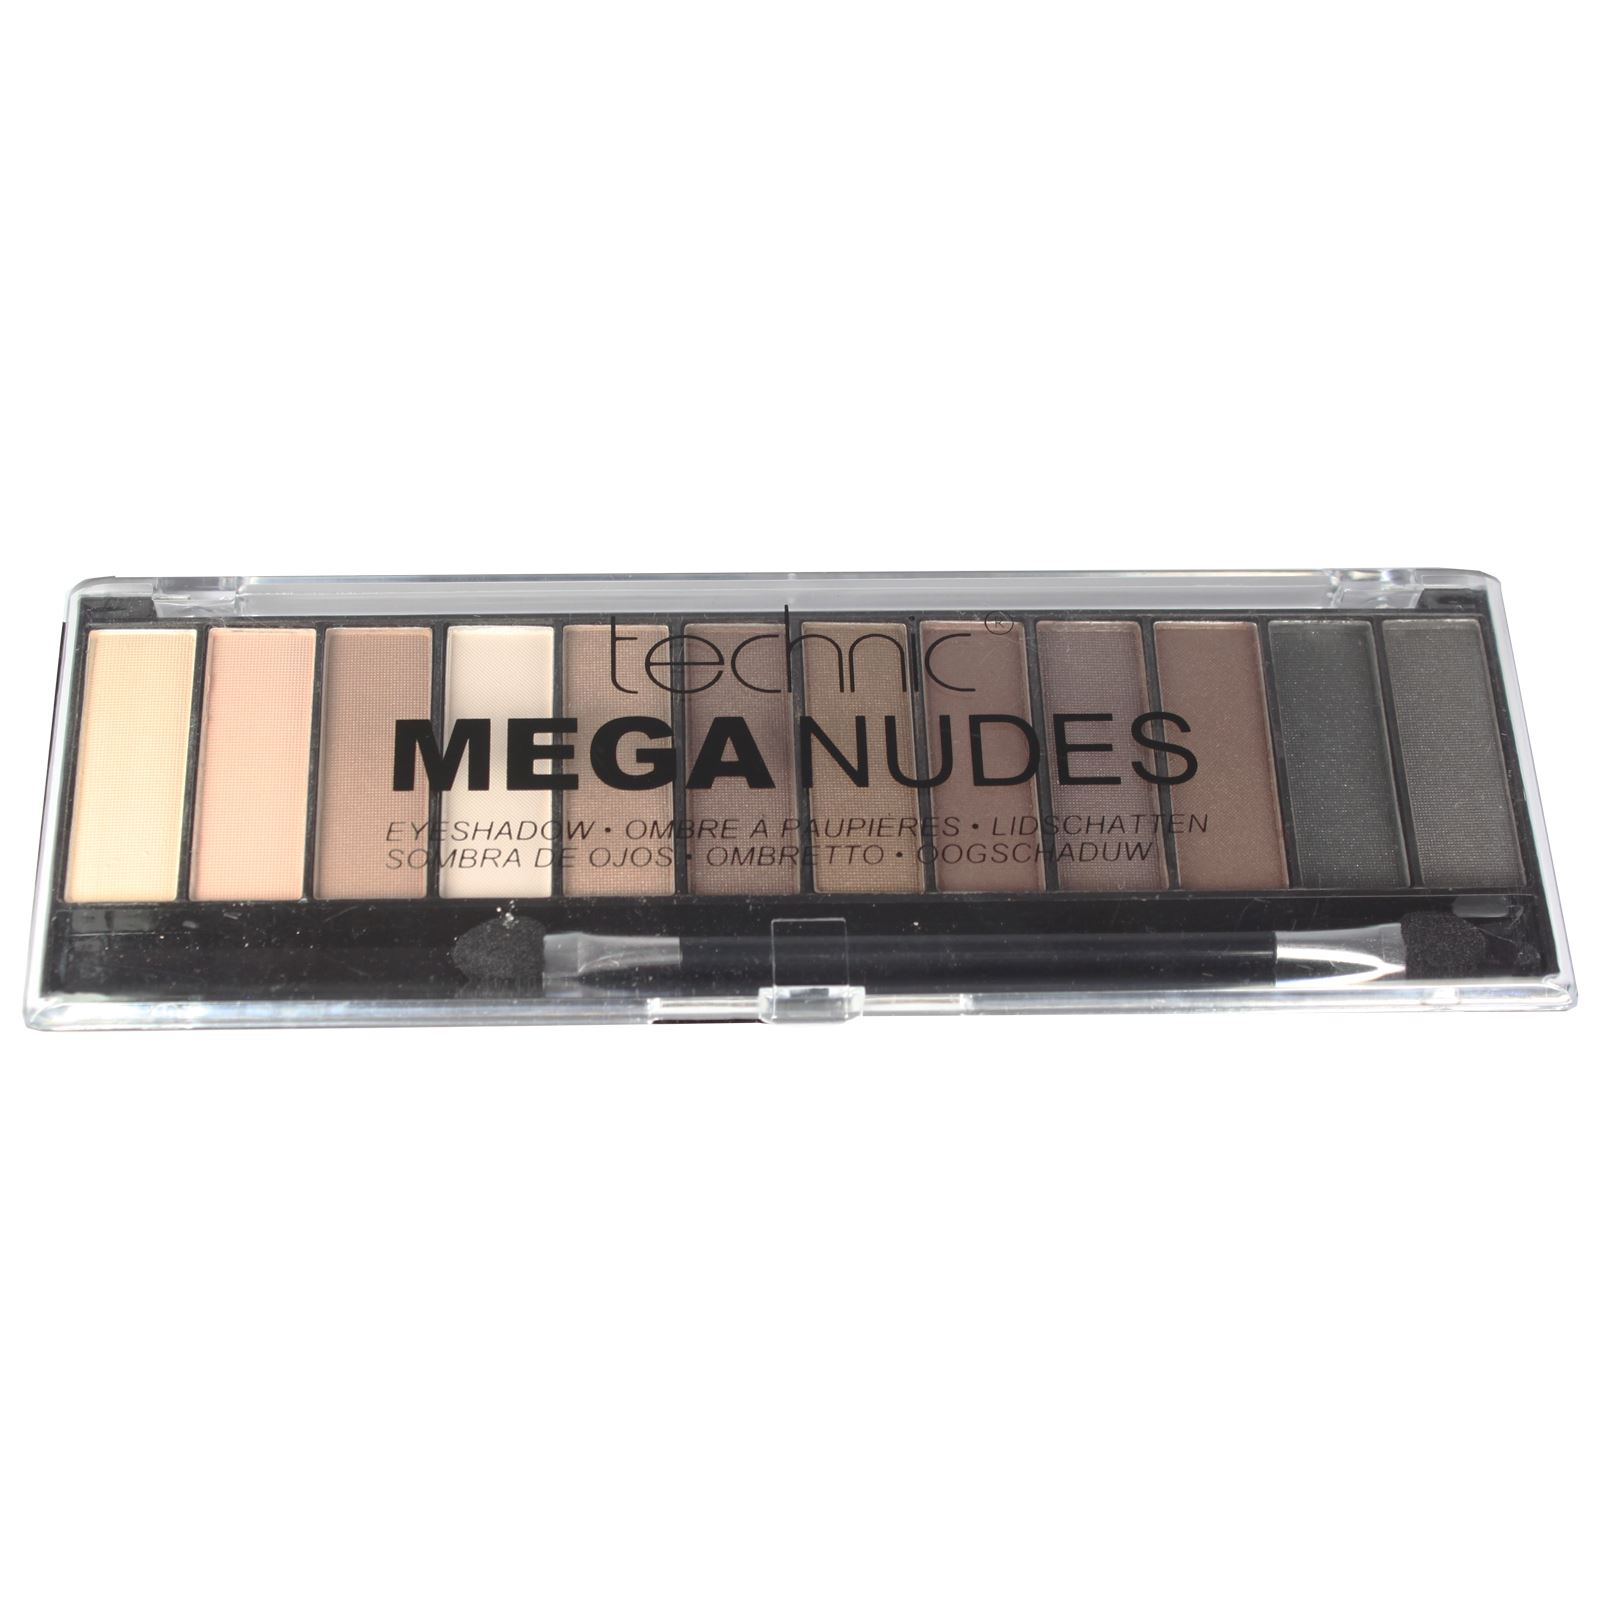 Technic-Mega-Nude-Eyeshadow-Palette-Matte-Shimmer-Pink-Bronze-Gold-Brown-Shadow